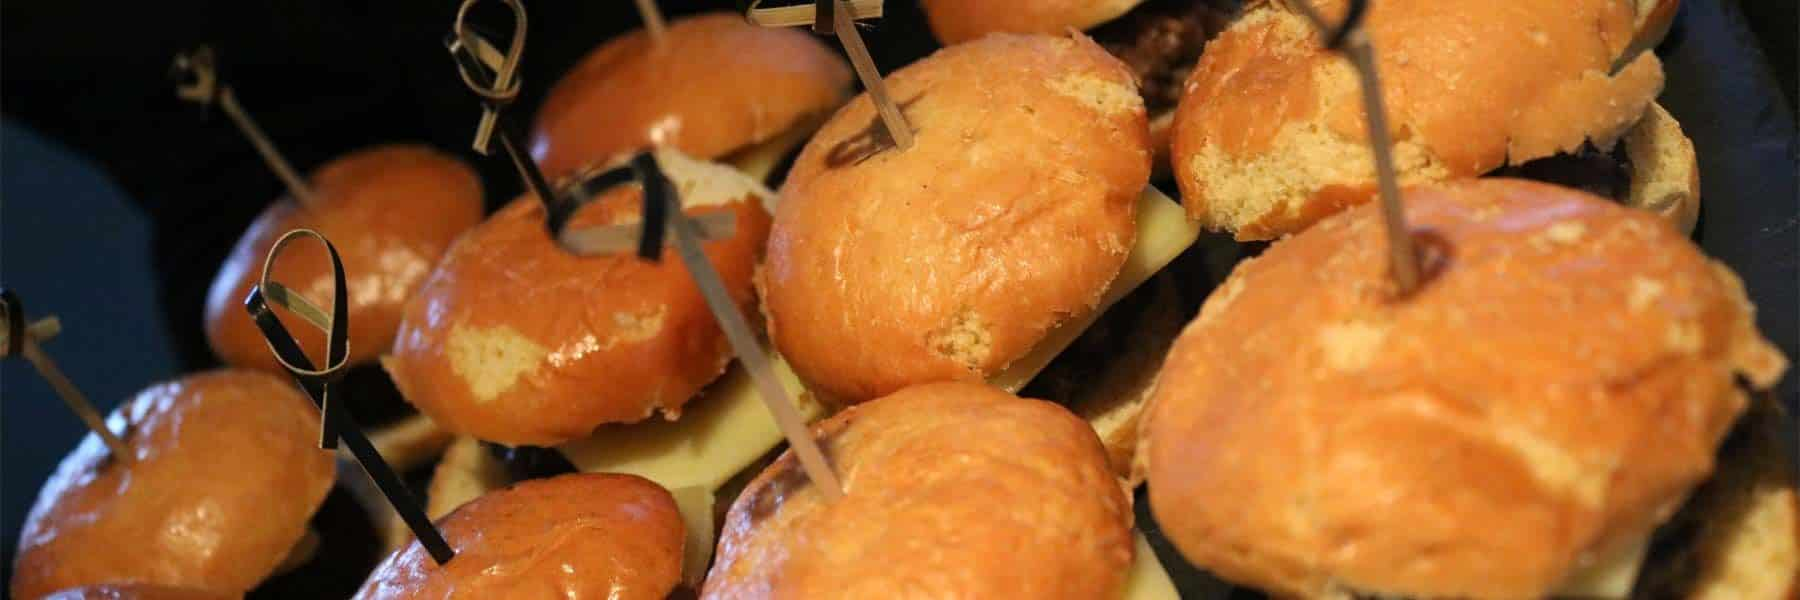 Miniature Burgers